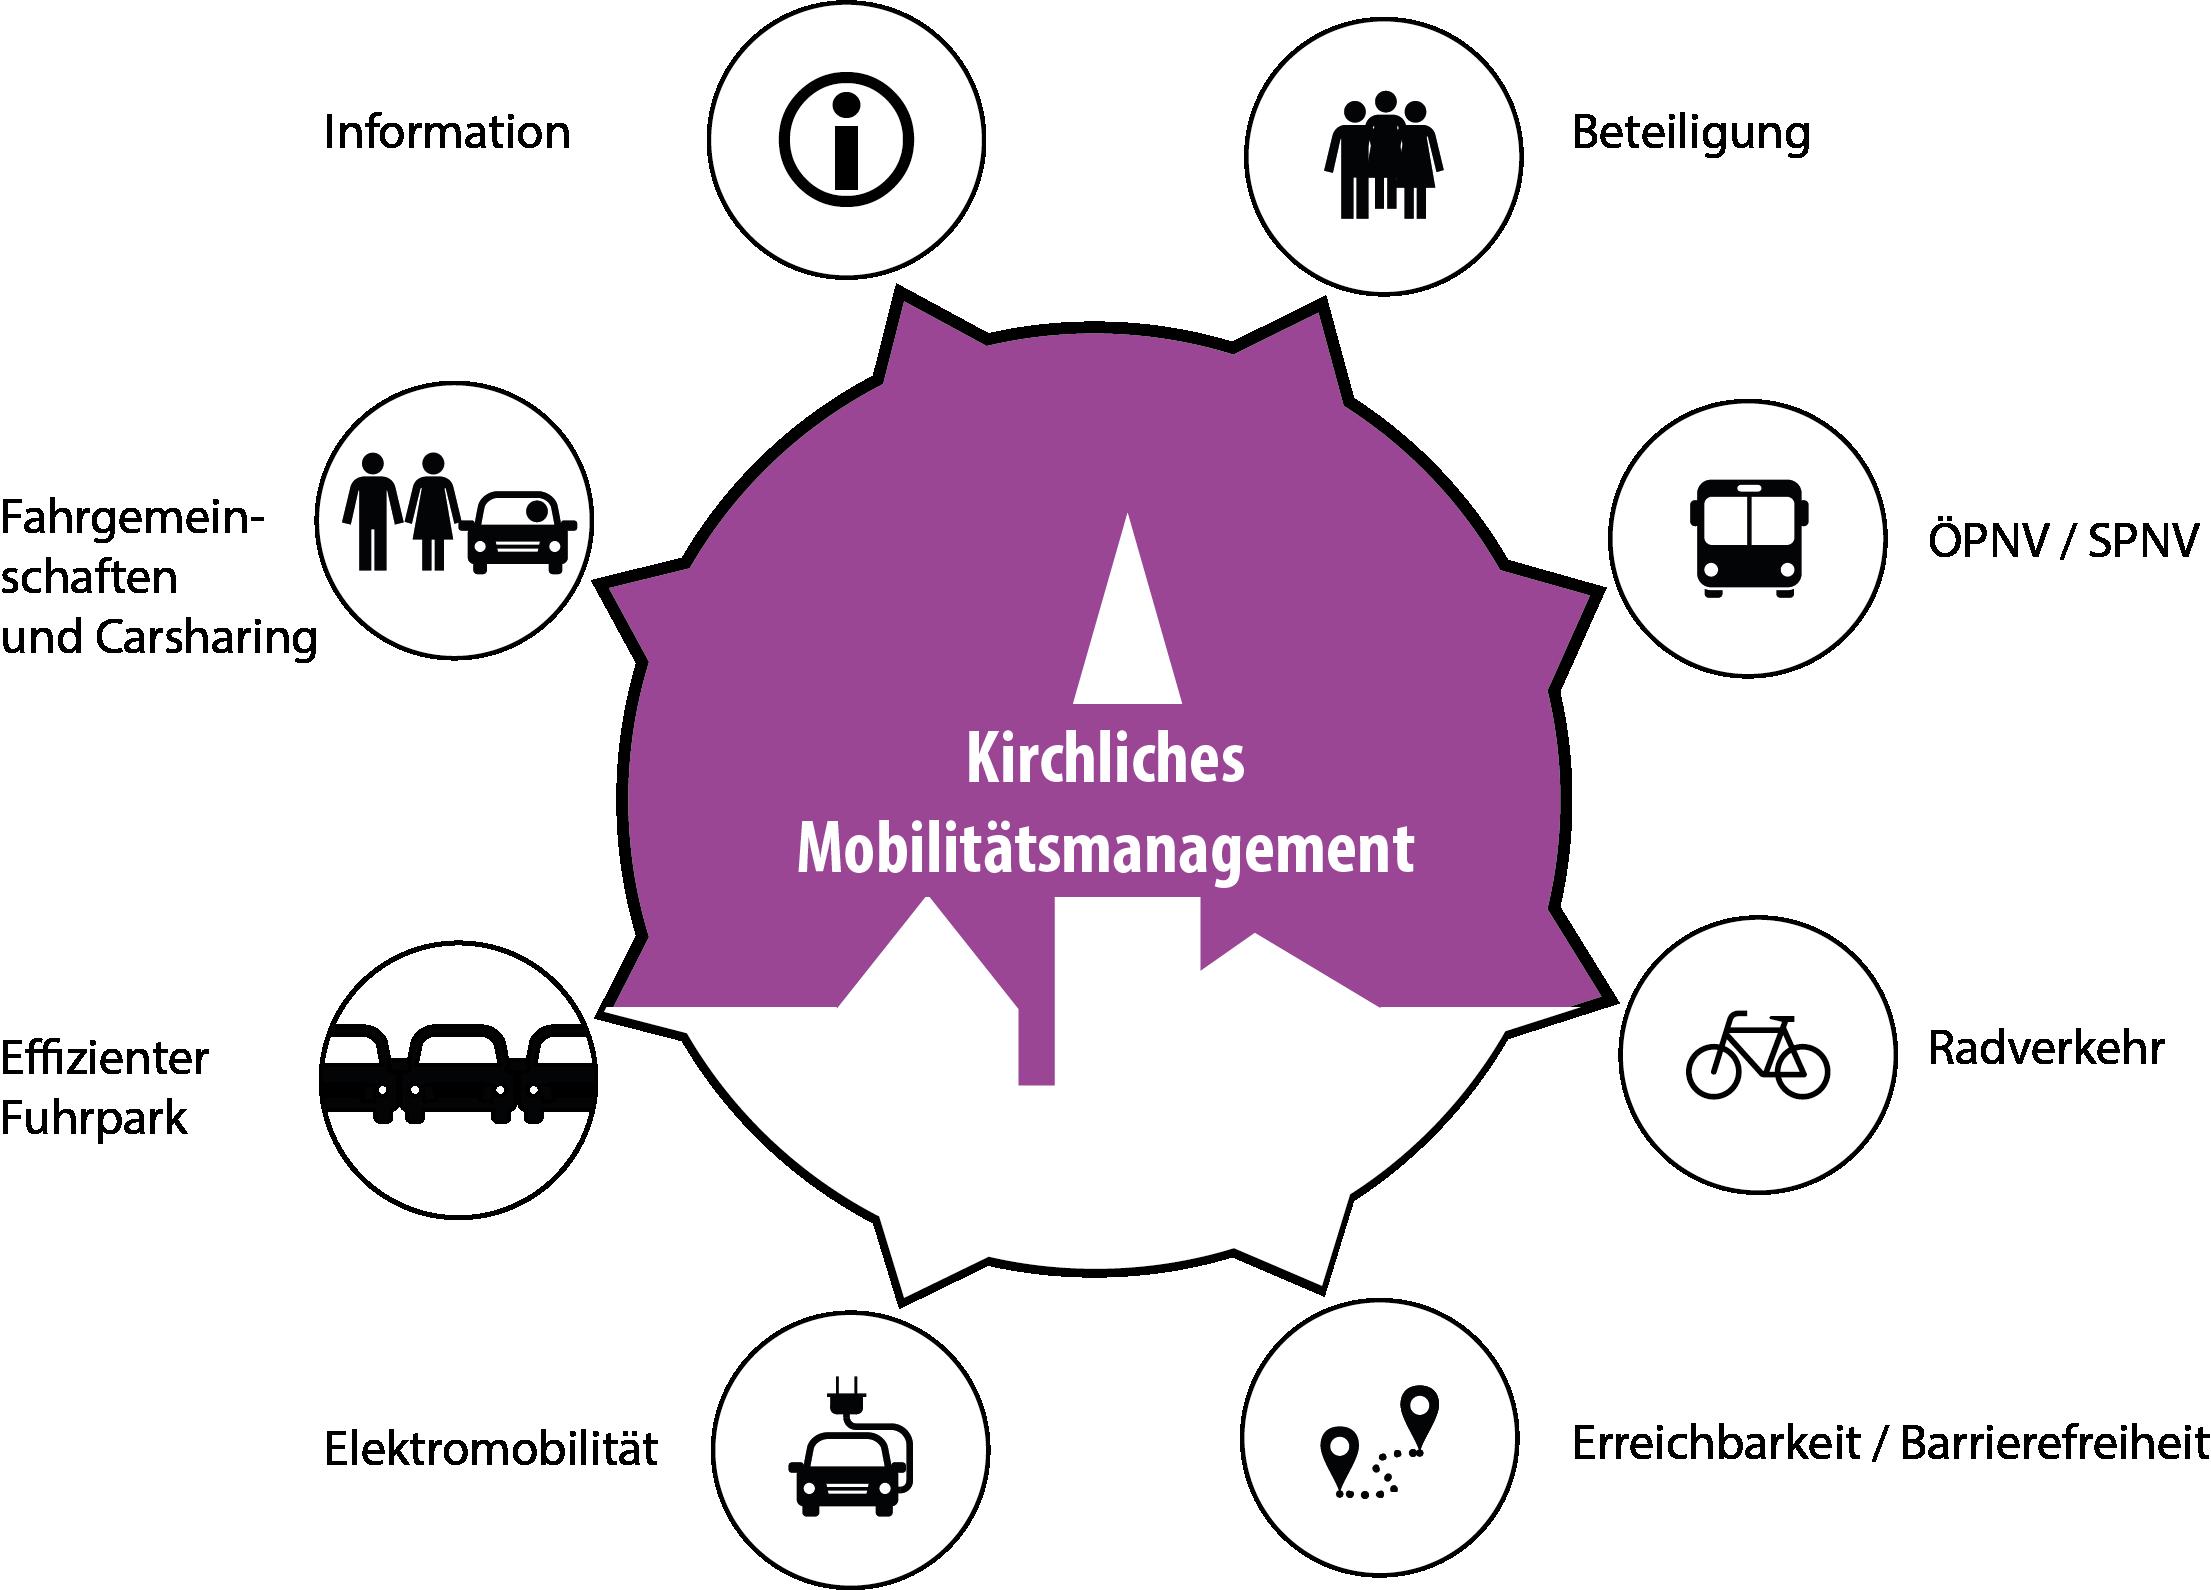 Symbol Kirchliches Mobilitätsmanagement